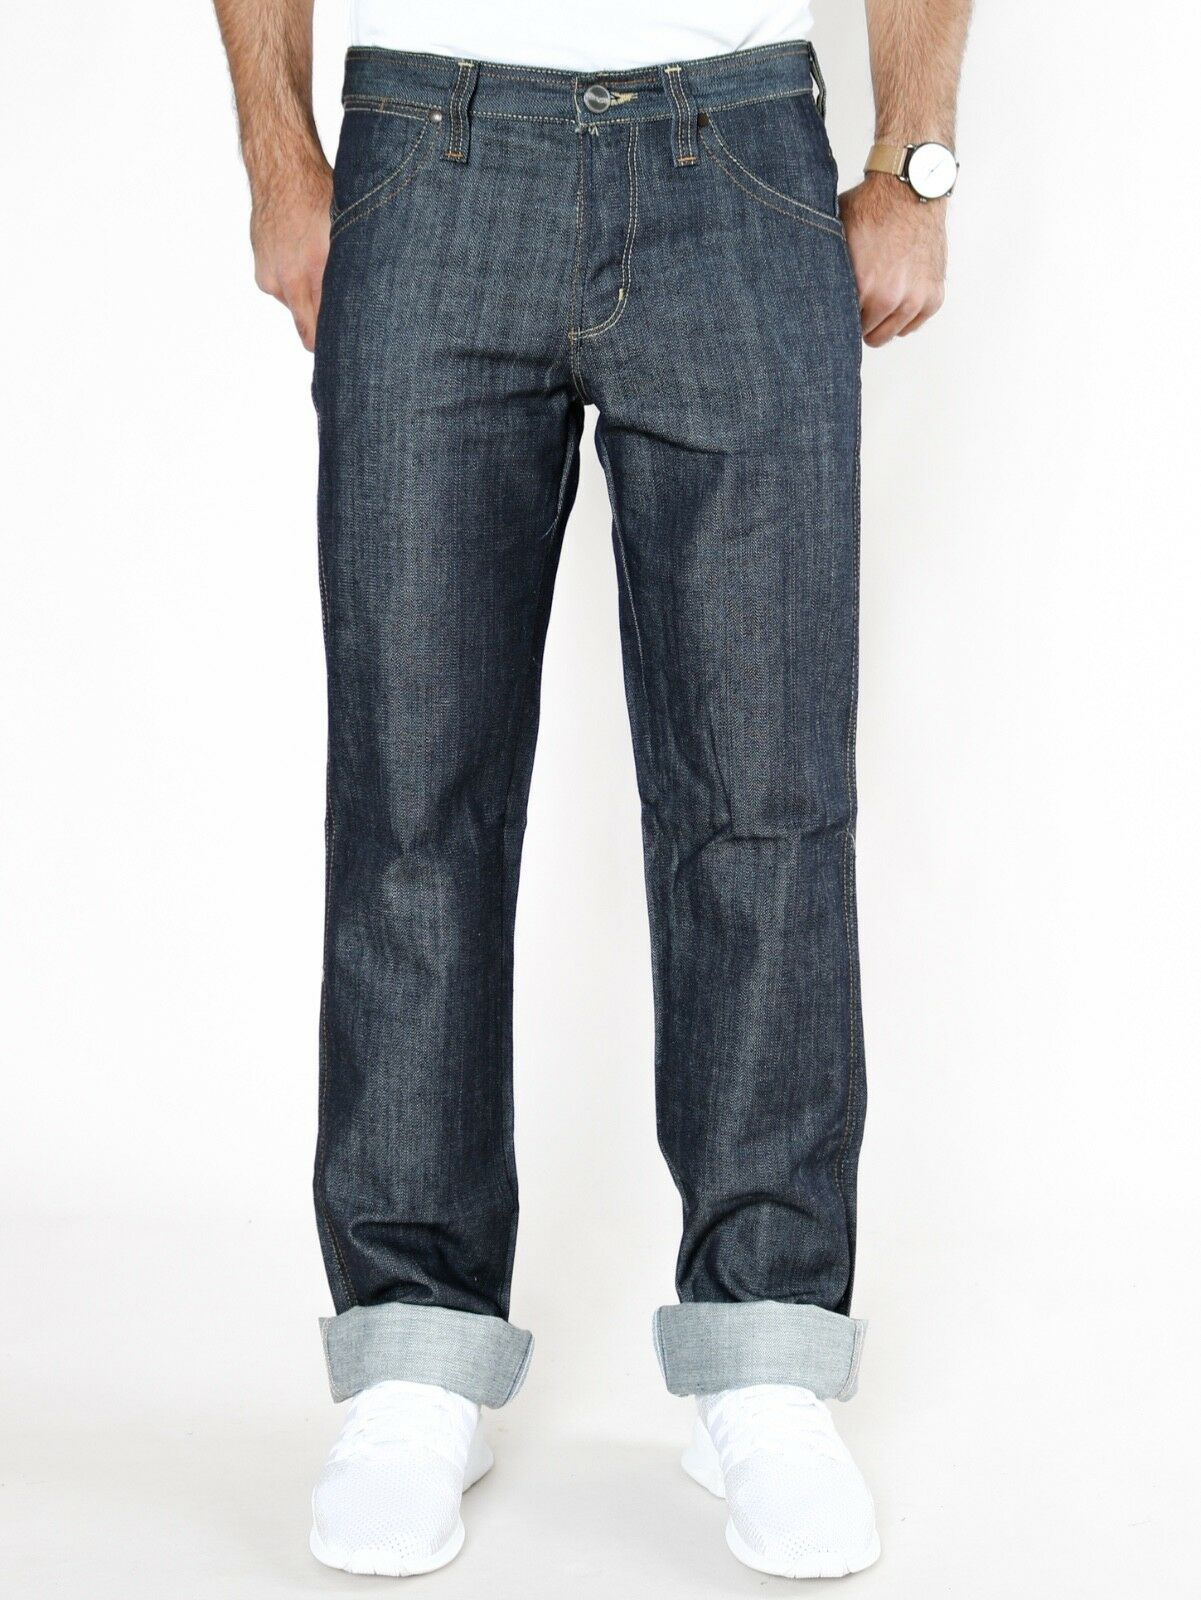 WRANGLER Uomo Jeans-Pantaloni Sly-Straight Leg Slim Slim Slim Fit-Indigo-Blu w31 l34 NUOVO 680174